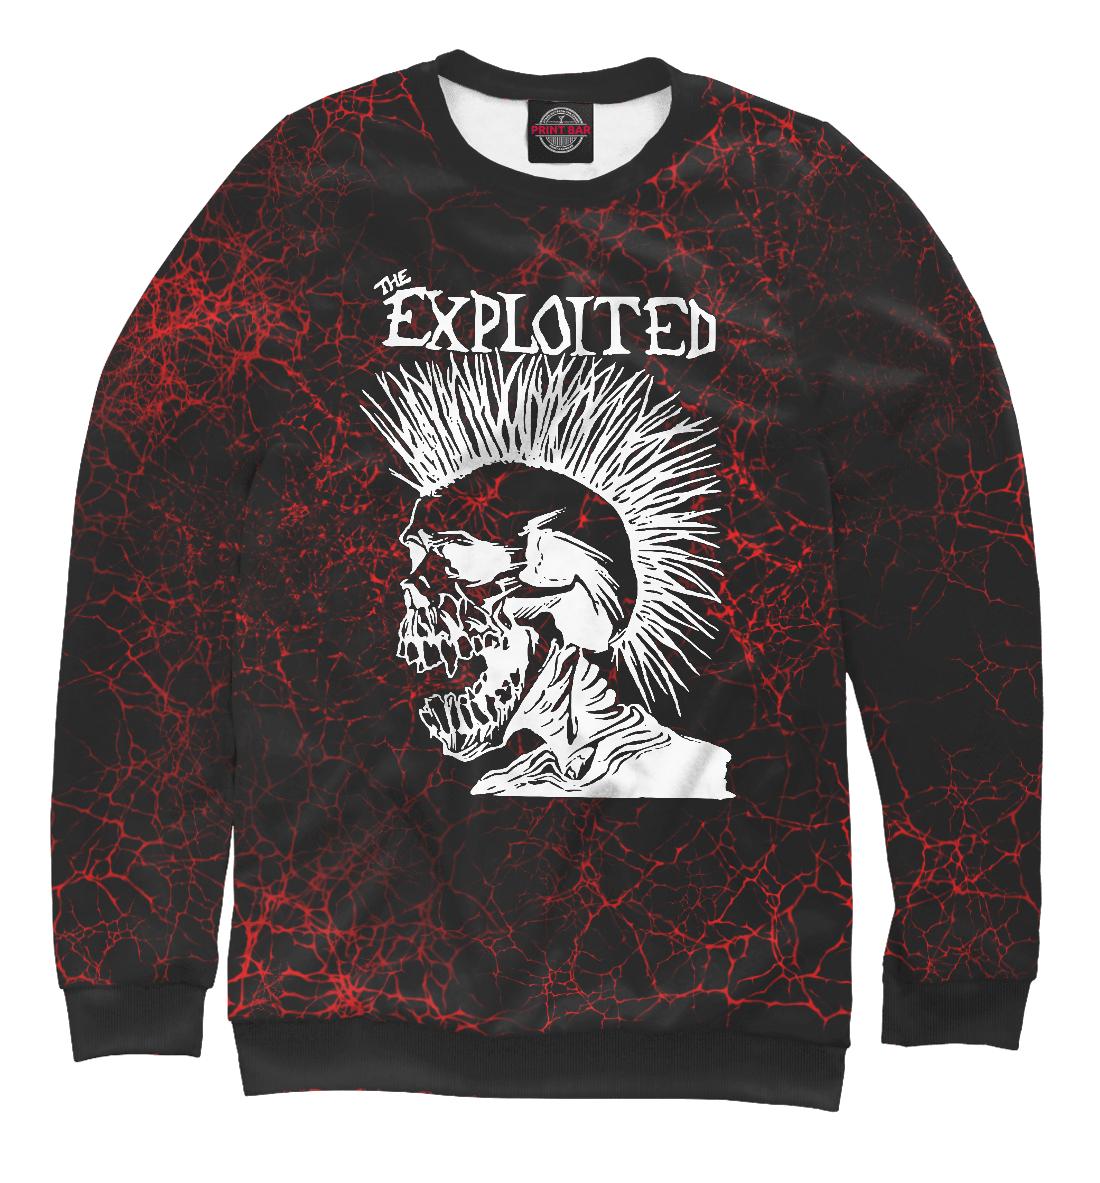 Купить The Exploited, Printbar, Свитшоты, TEX-767546-swi-1